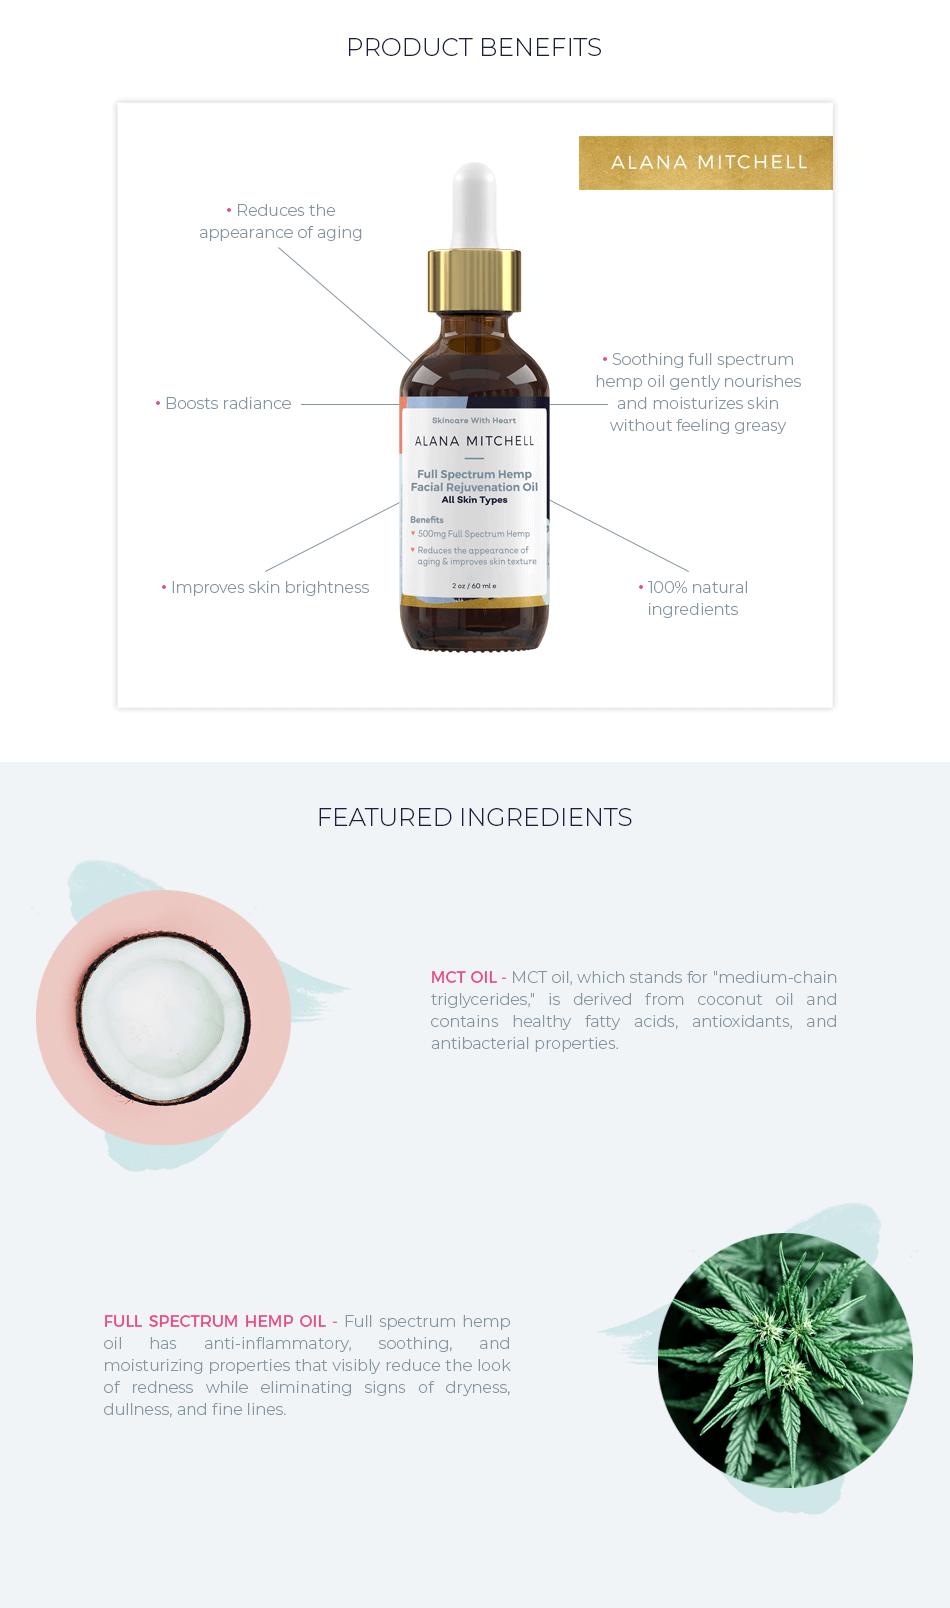 alana mitchell full spectrum hemp facial oil